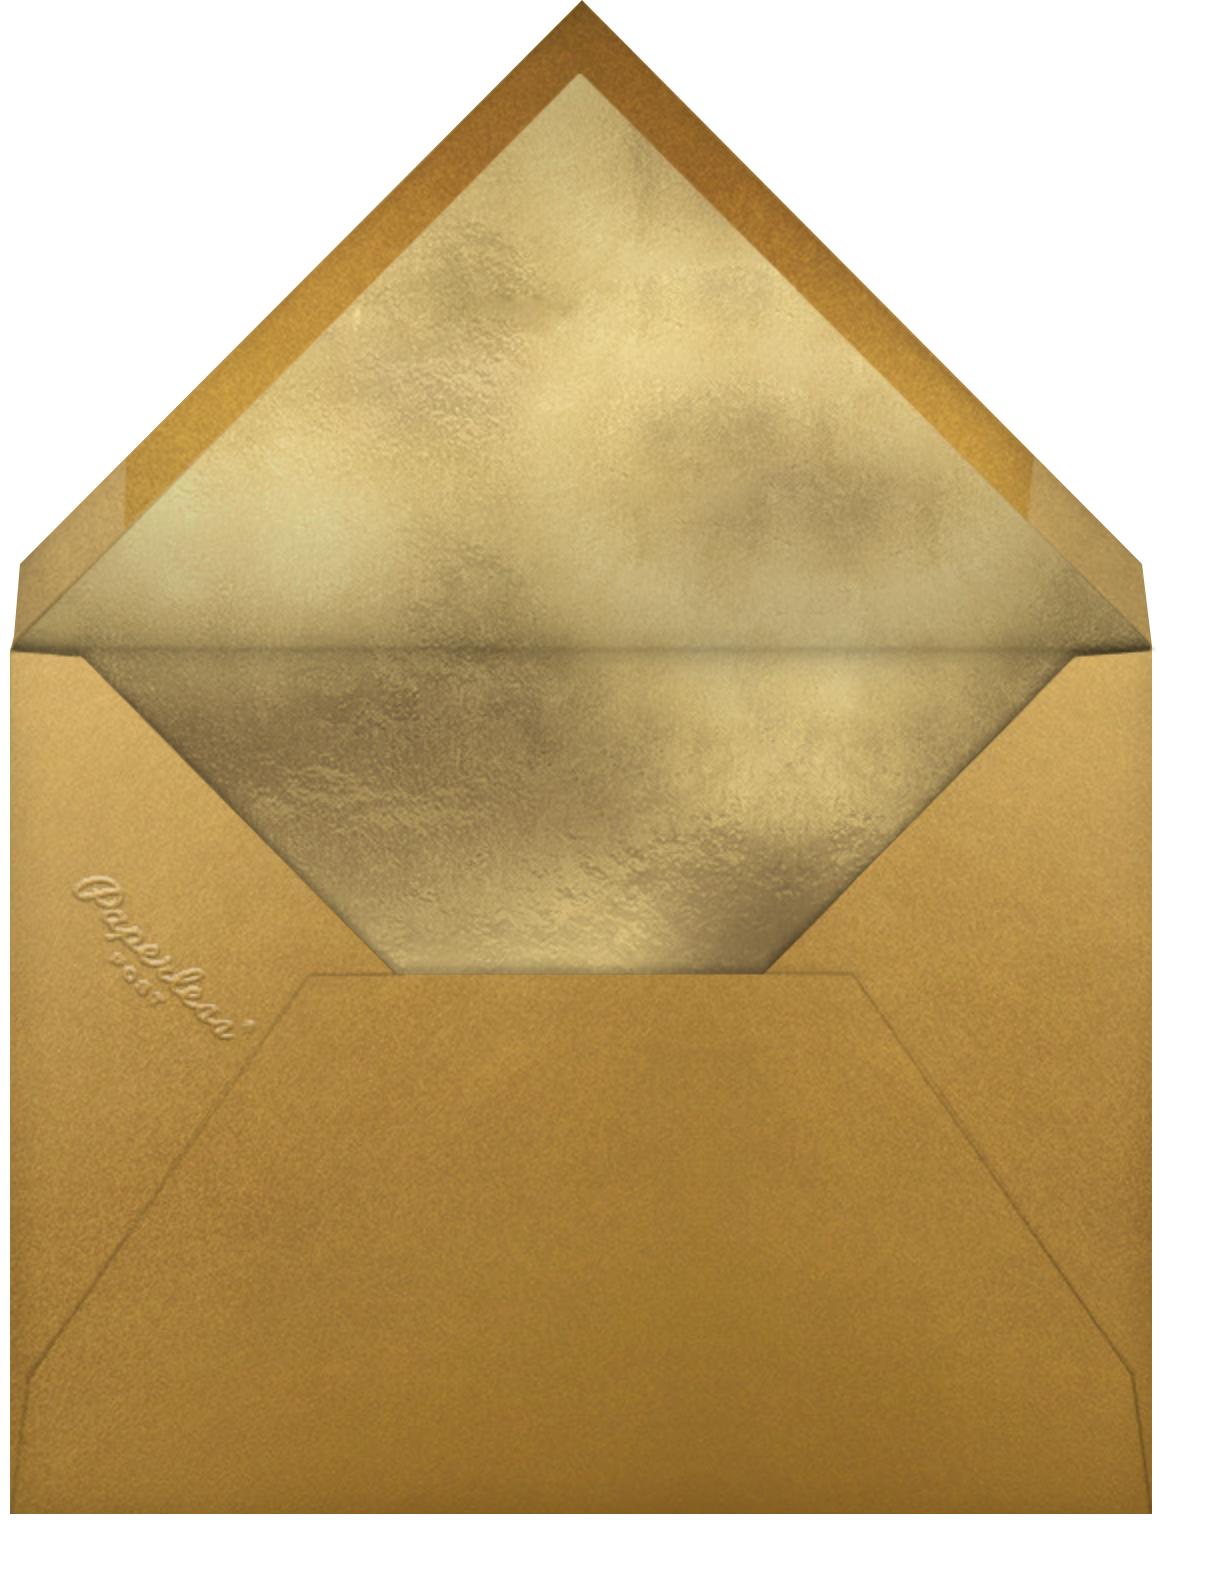 Paper Lantern (Invitation) - Paperless Post - Lunar New Year - envelope back